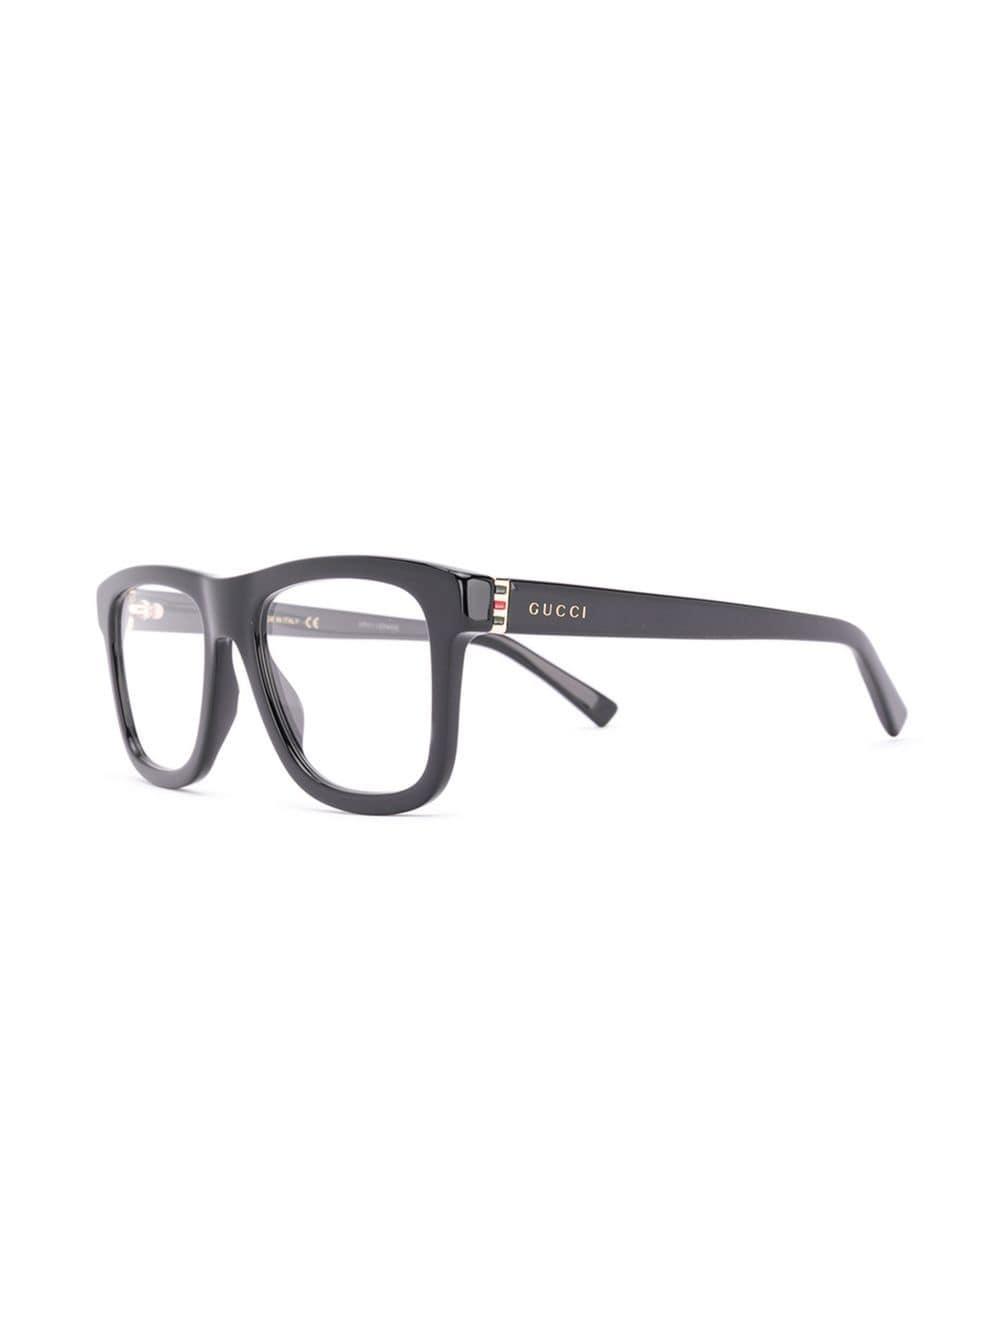 2f114208545 Lyst - Gucci Rectangular Frame Glasses in Black for Men